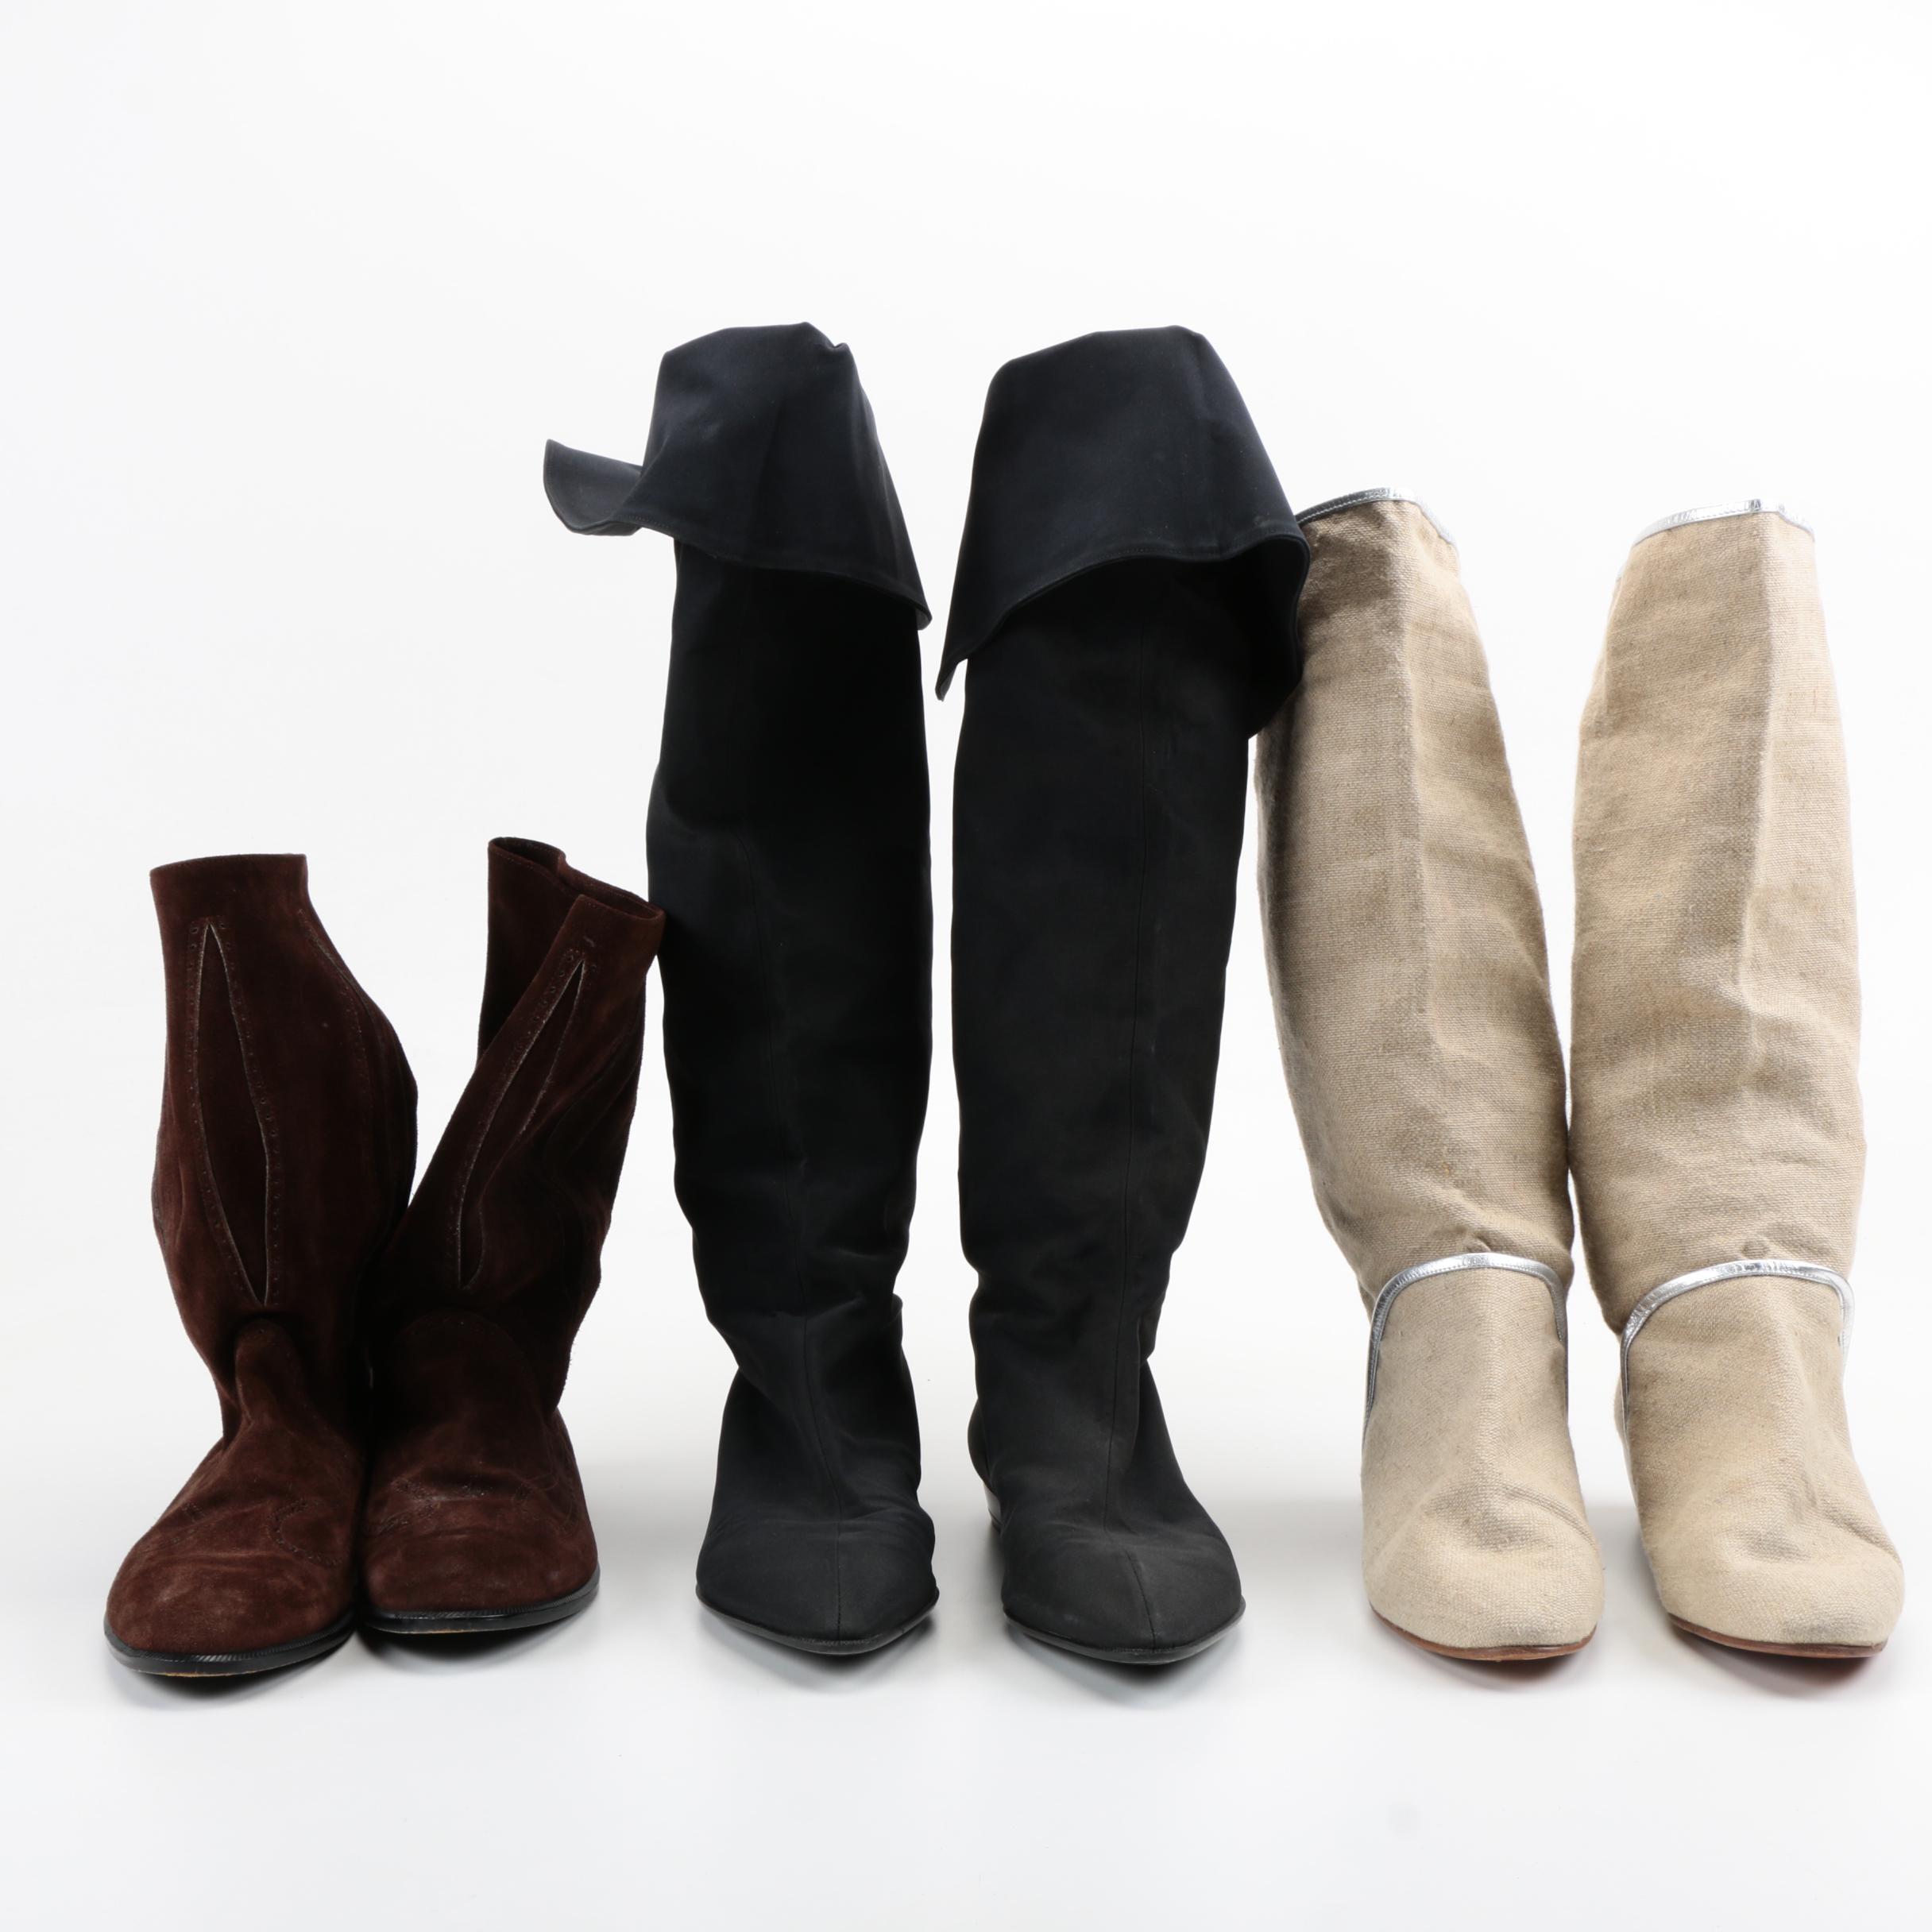 Women's Boots Including Charles Jourdan